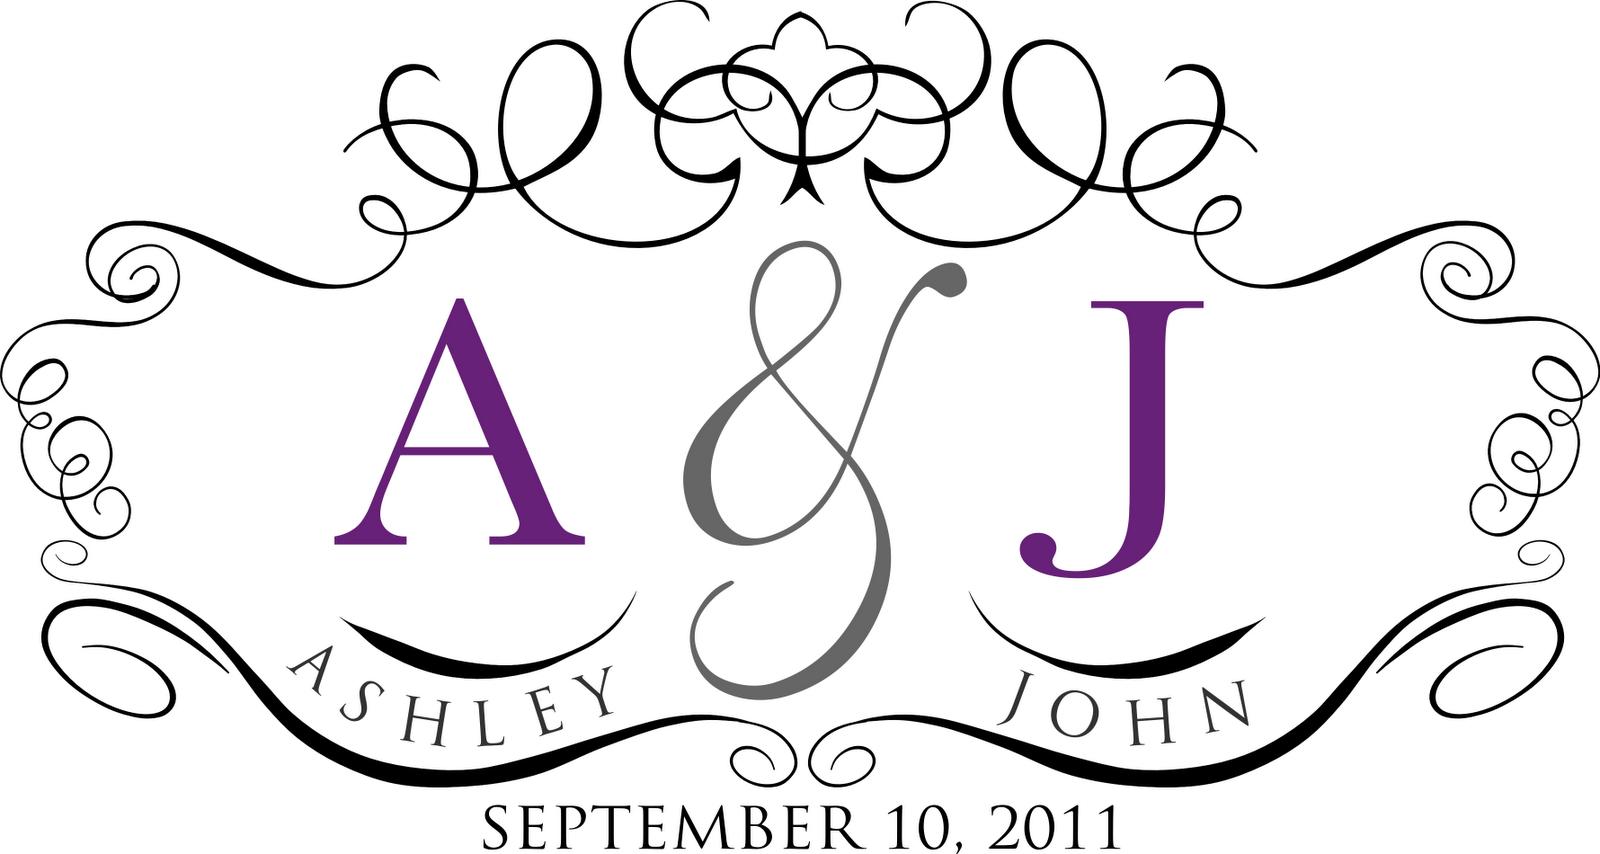 Free Monogram Templates | Custom wedding monogram for Ashley | britt ...